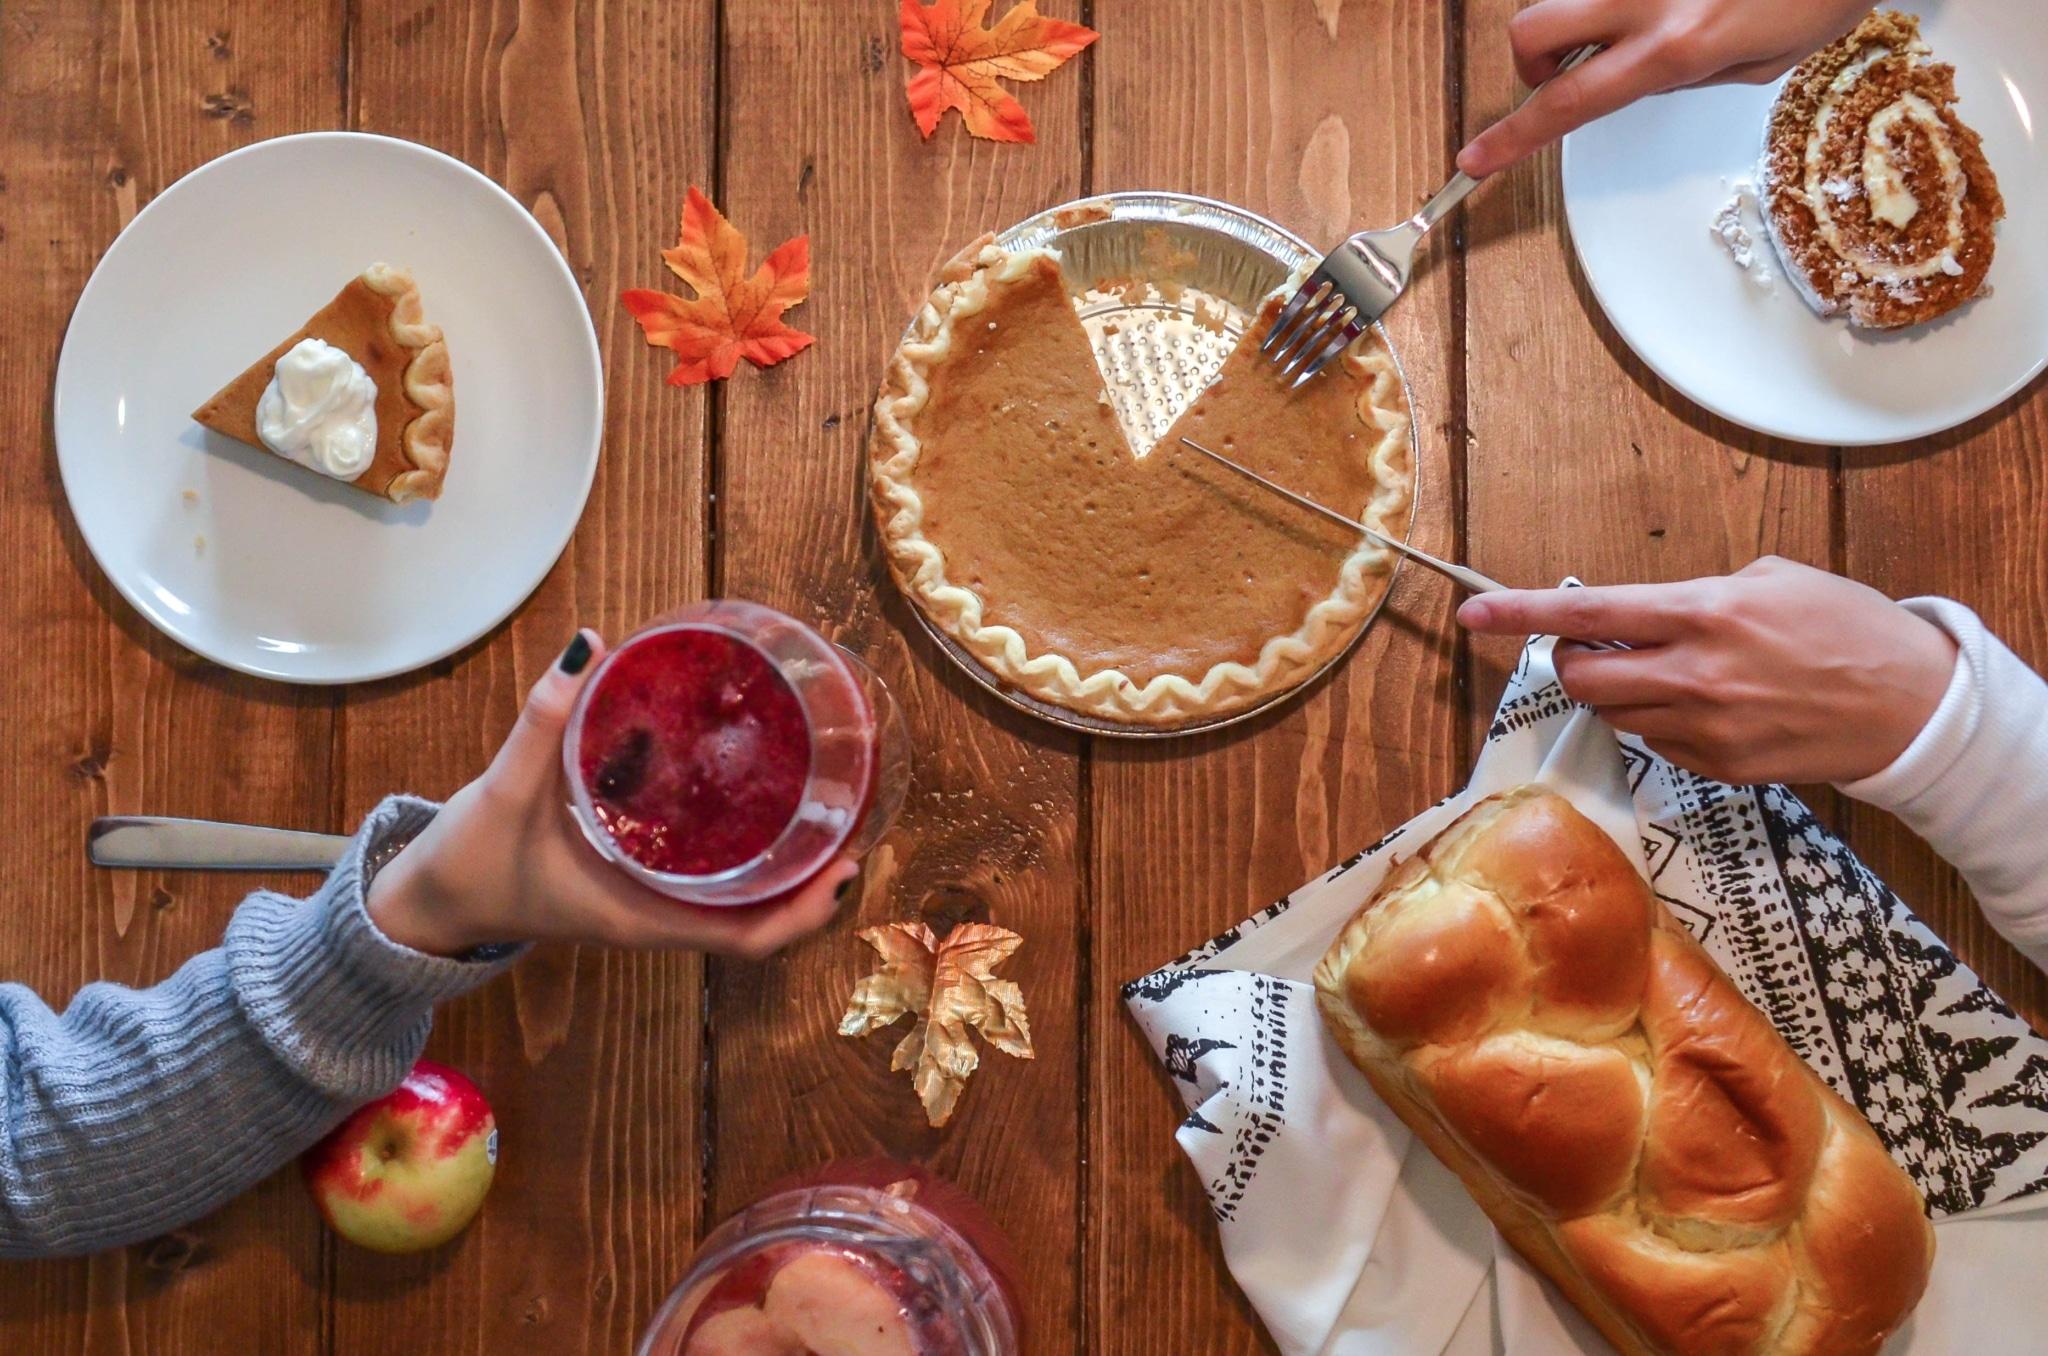 person slicing pie beside bread